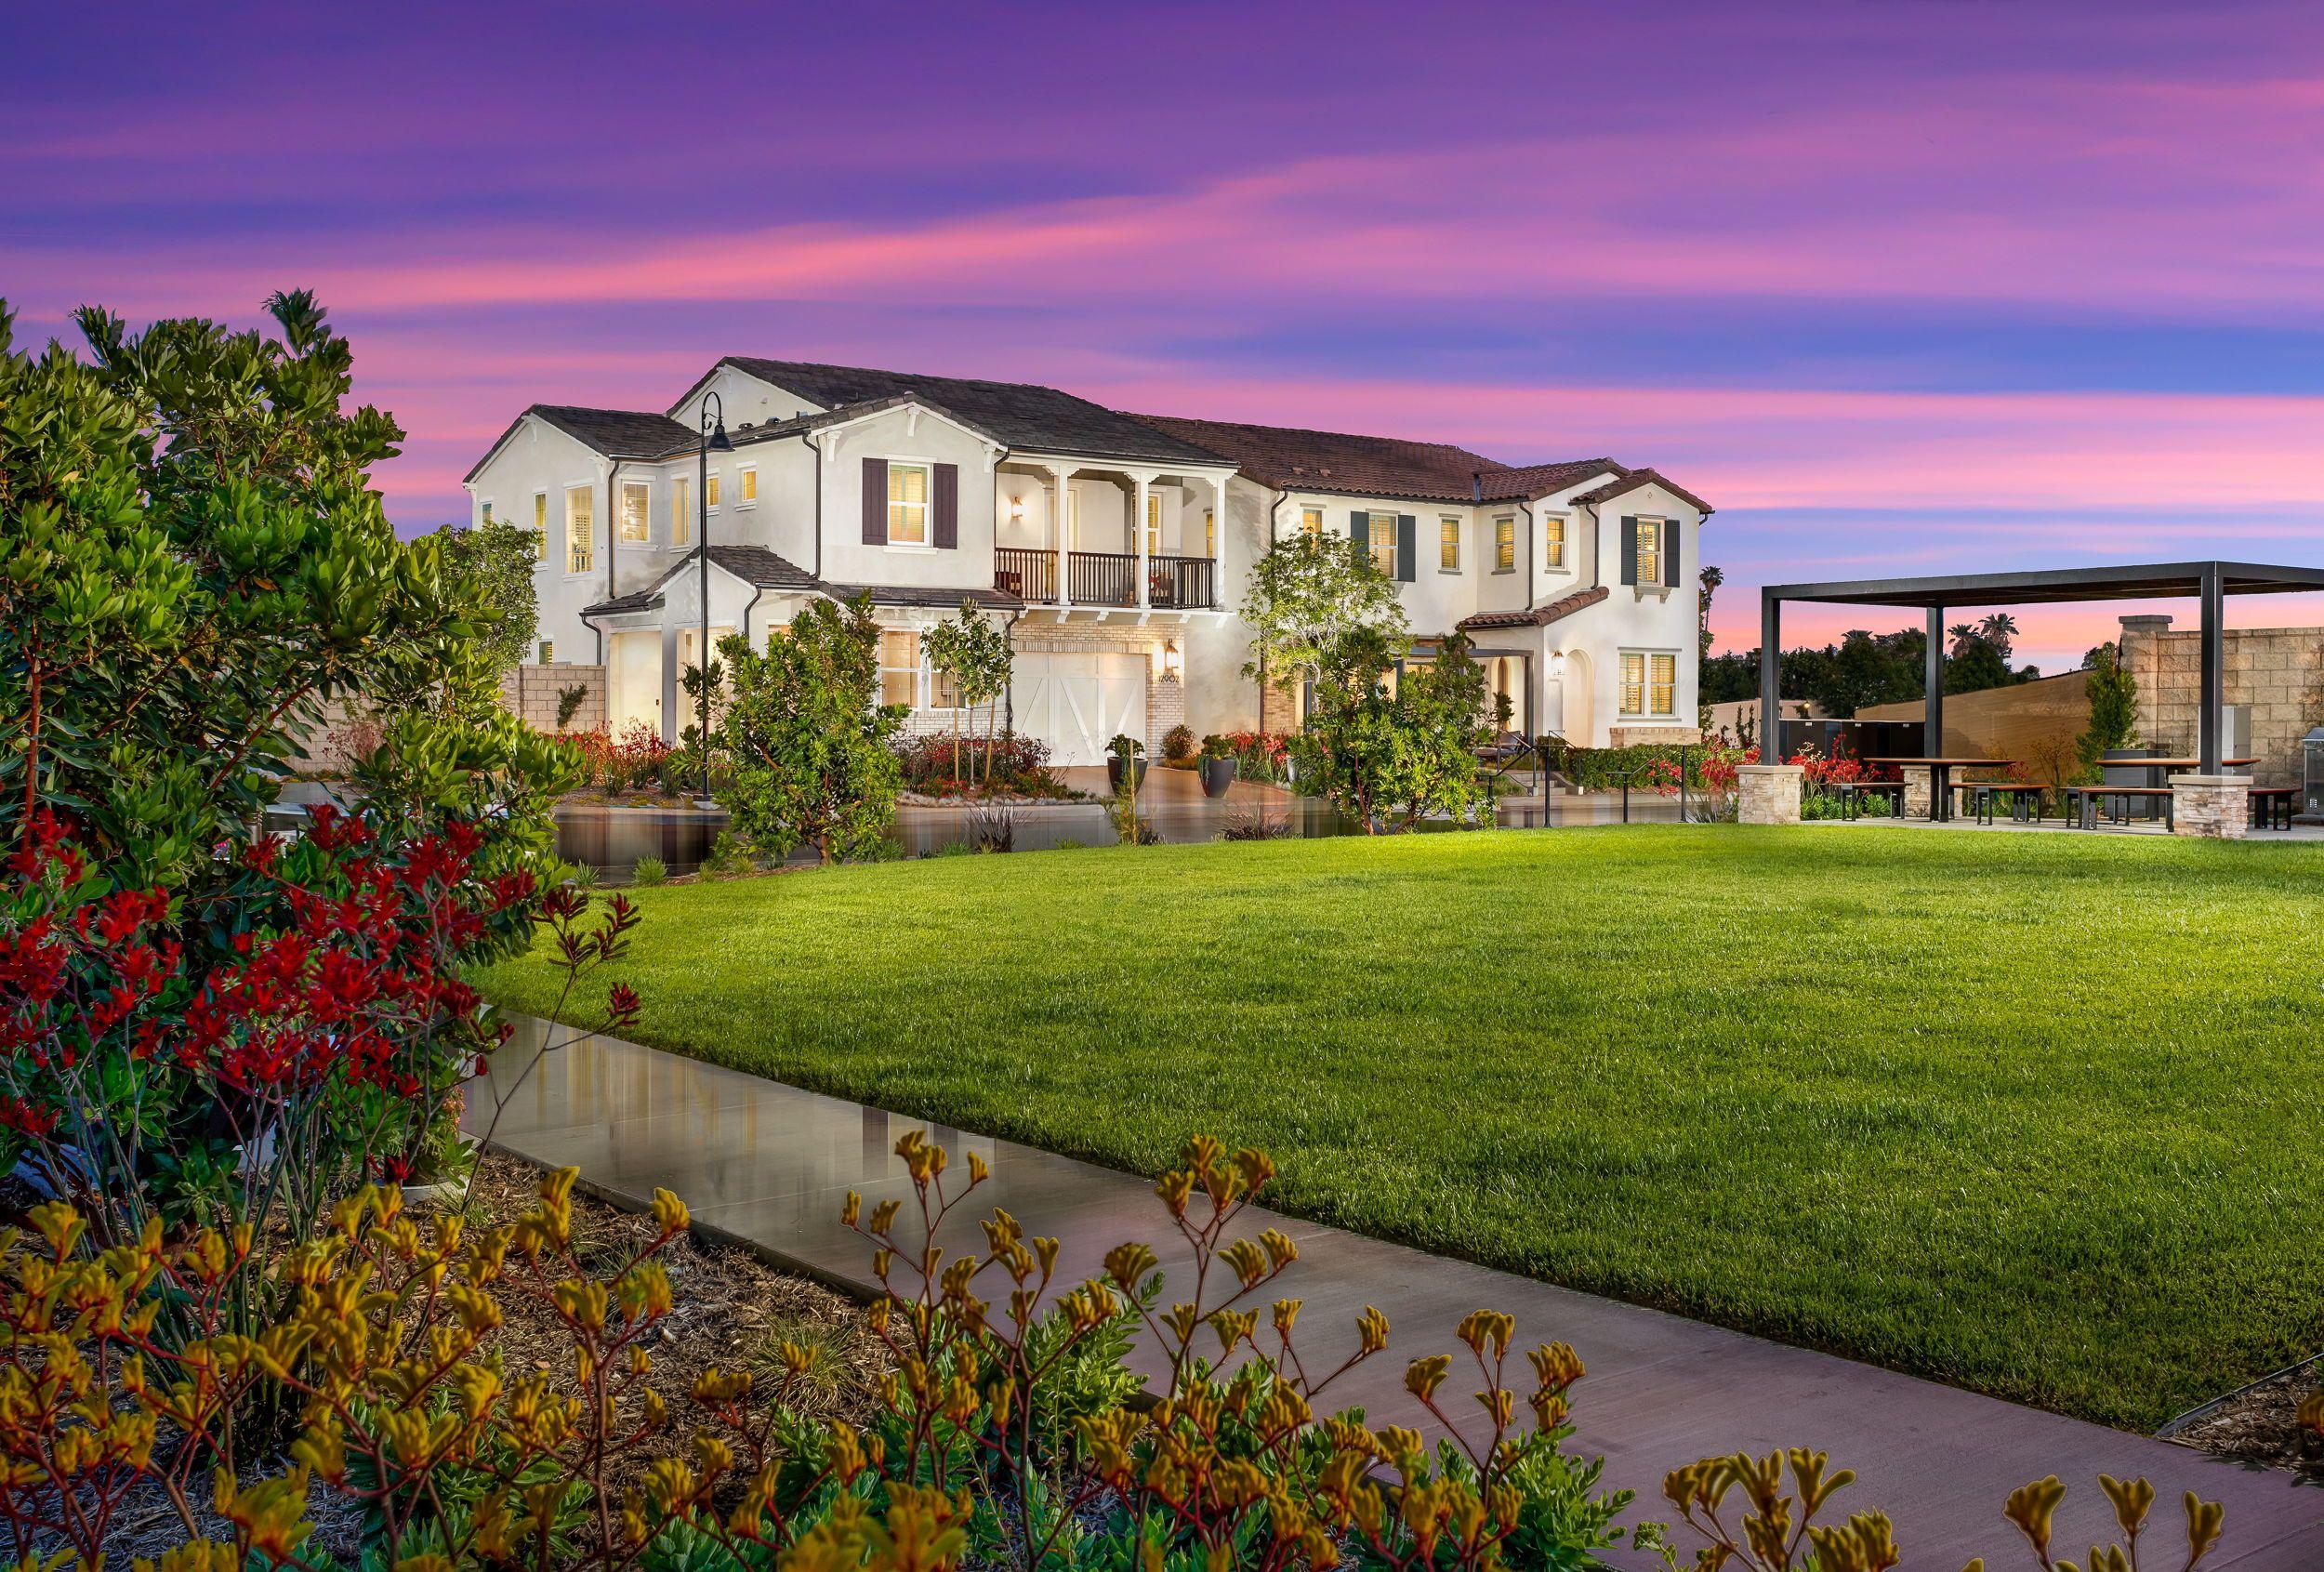 Gardenia Curb appeal, New home communities, Garden grove